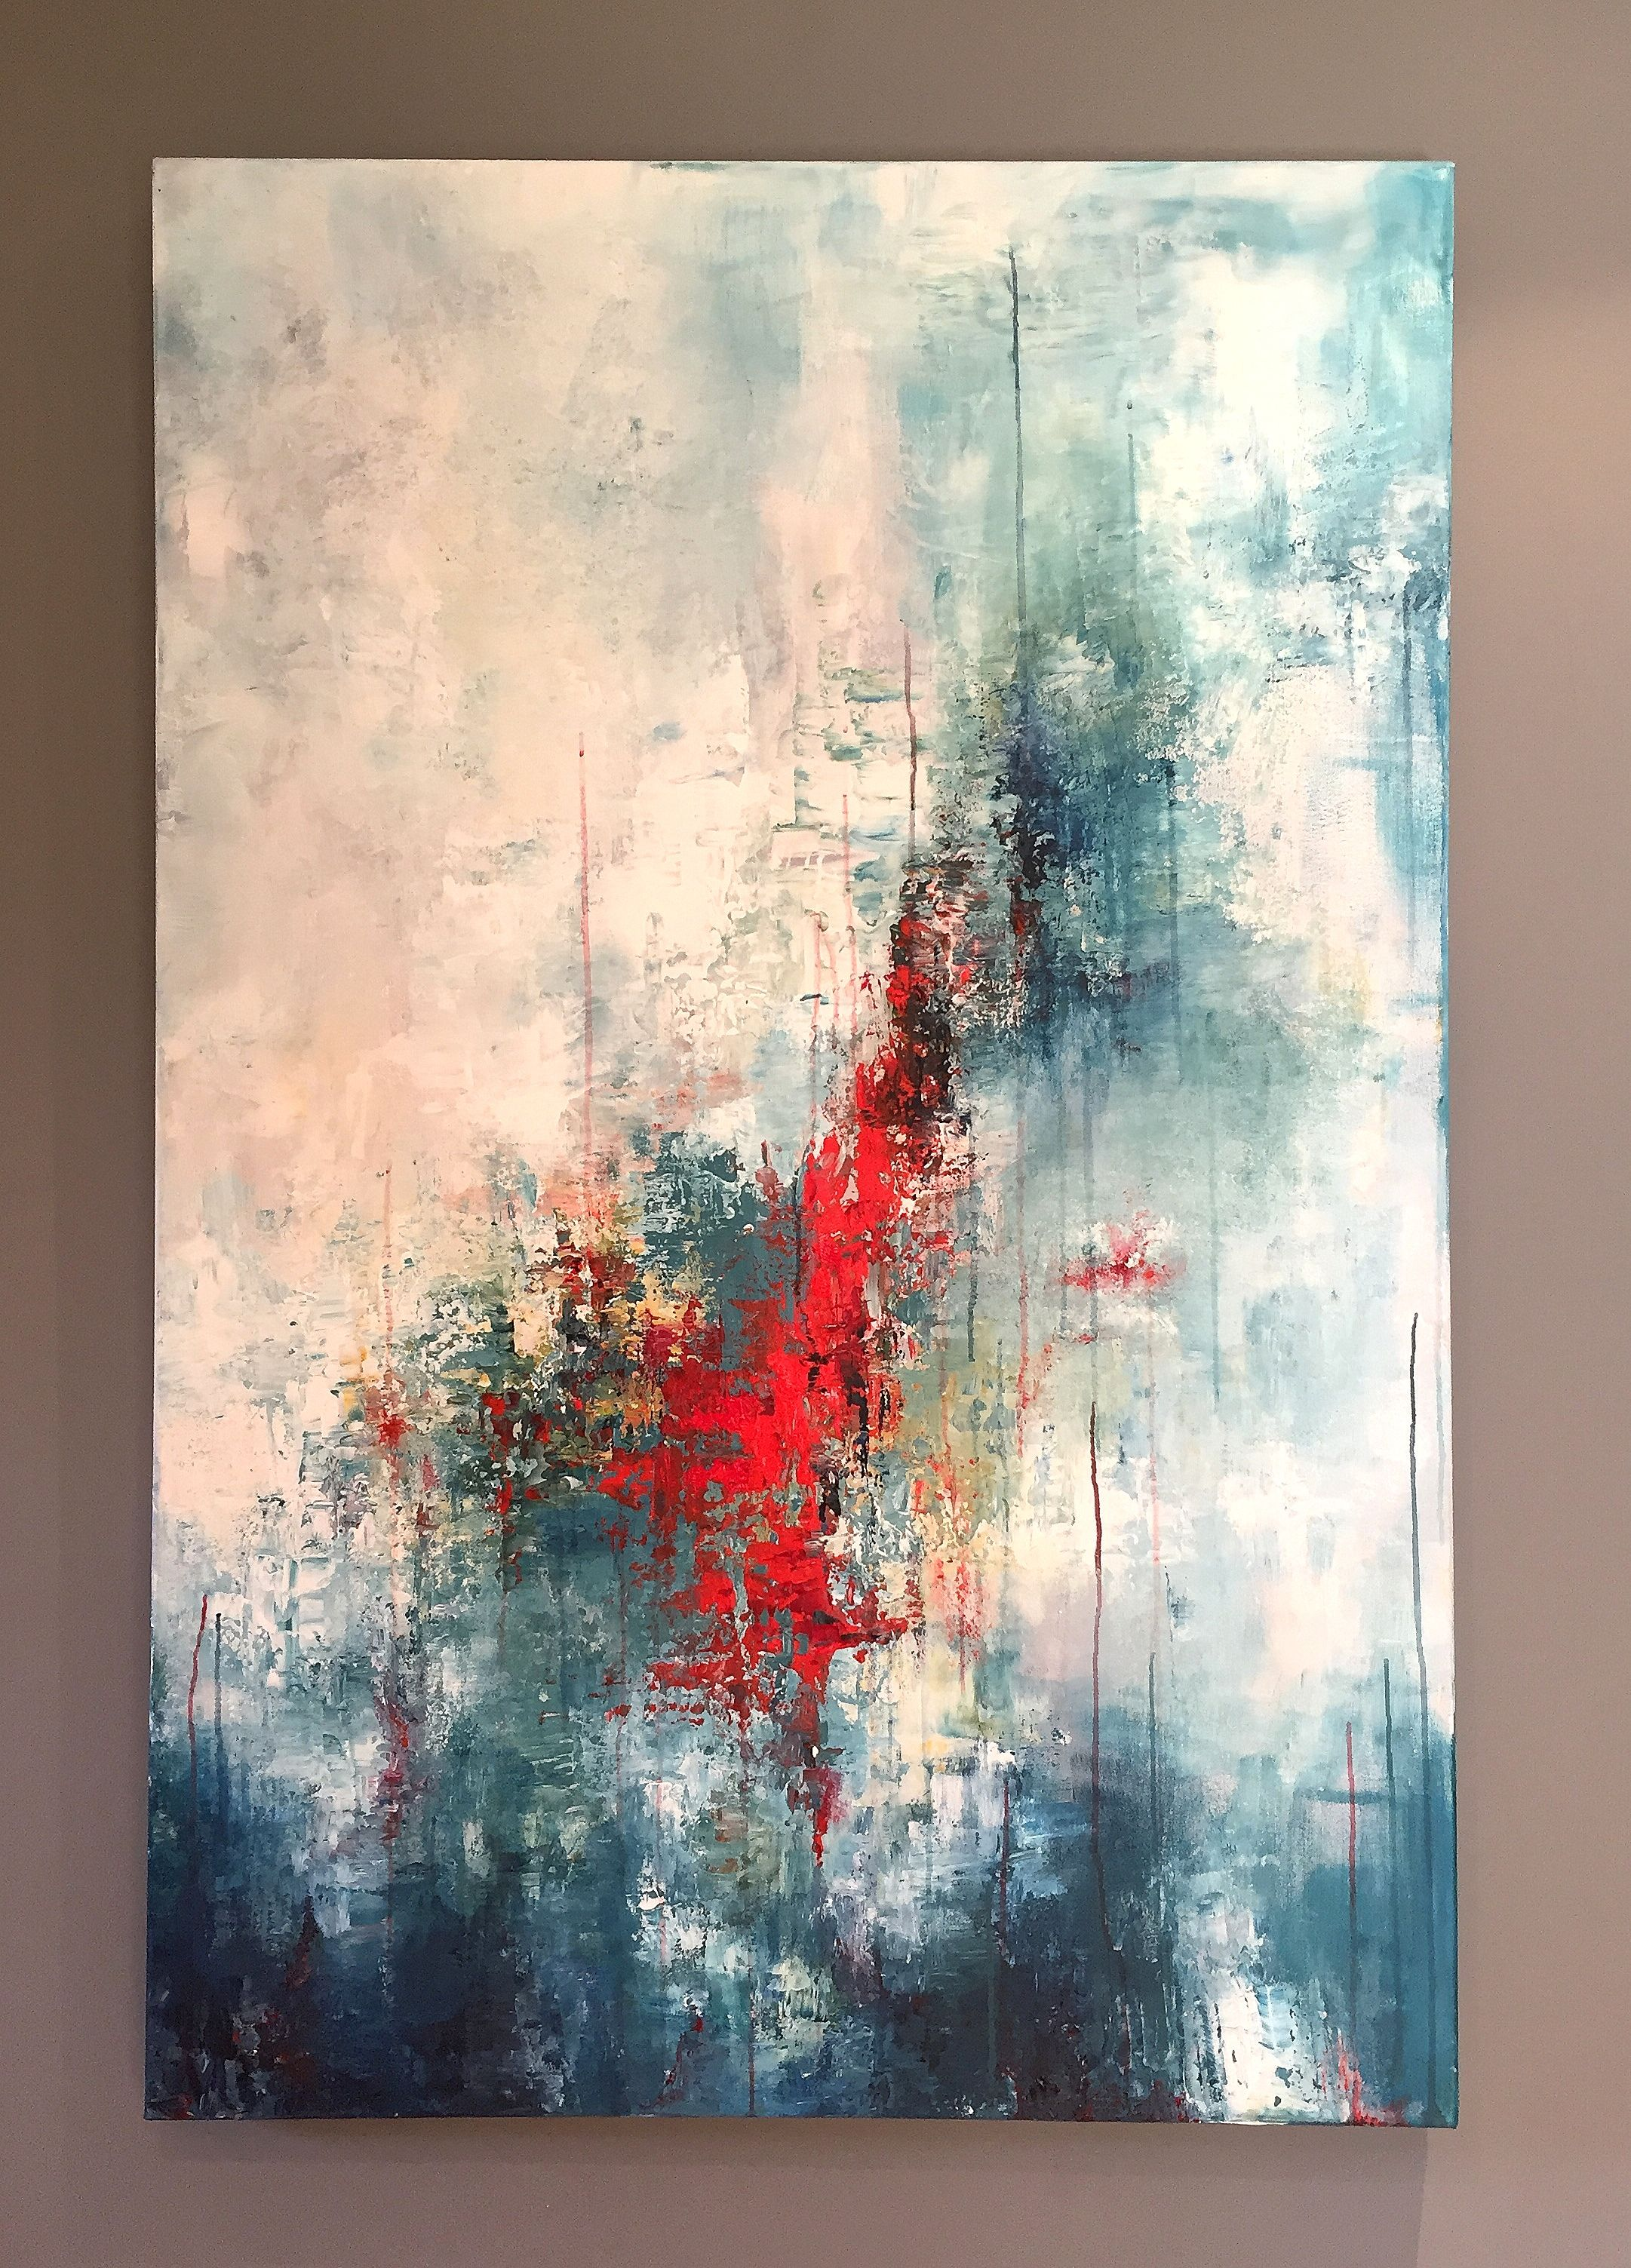 Hallucination - 120 x 80 cm, peinture acrylique